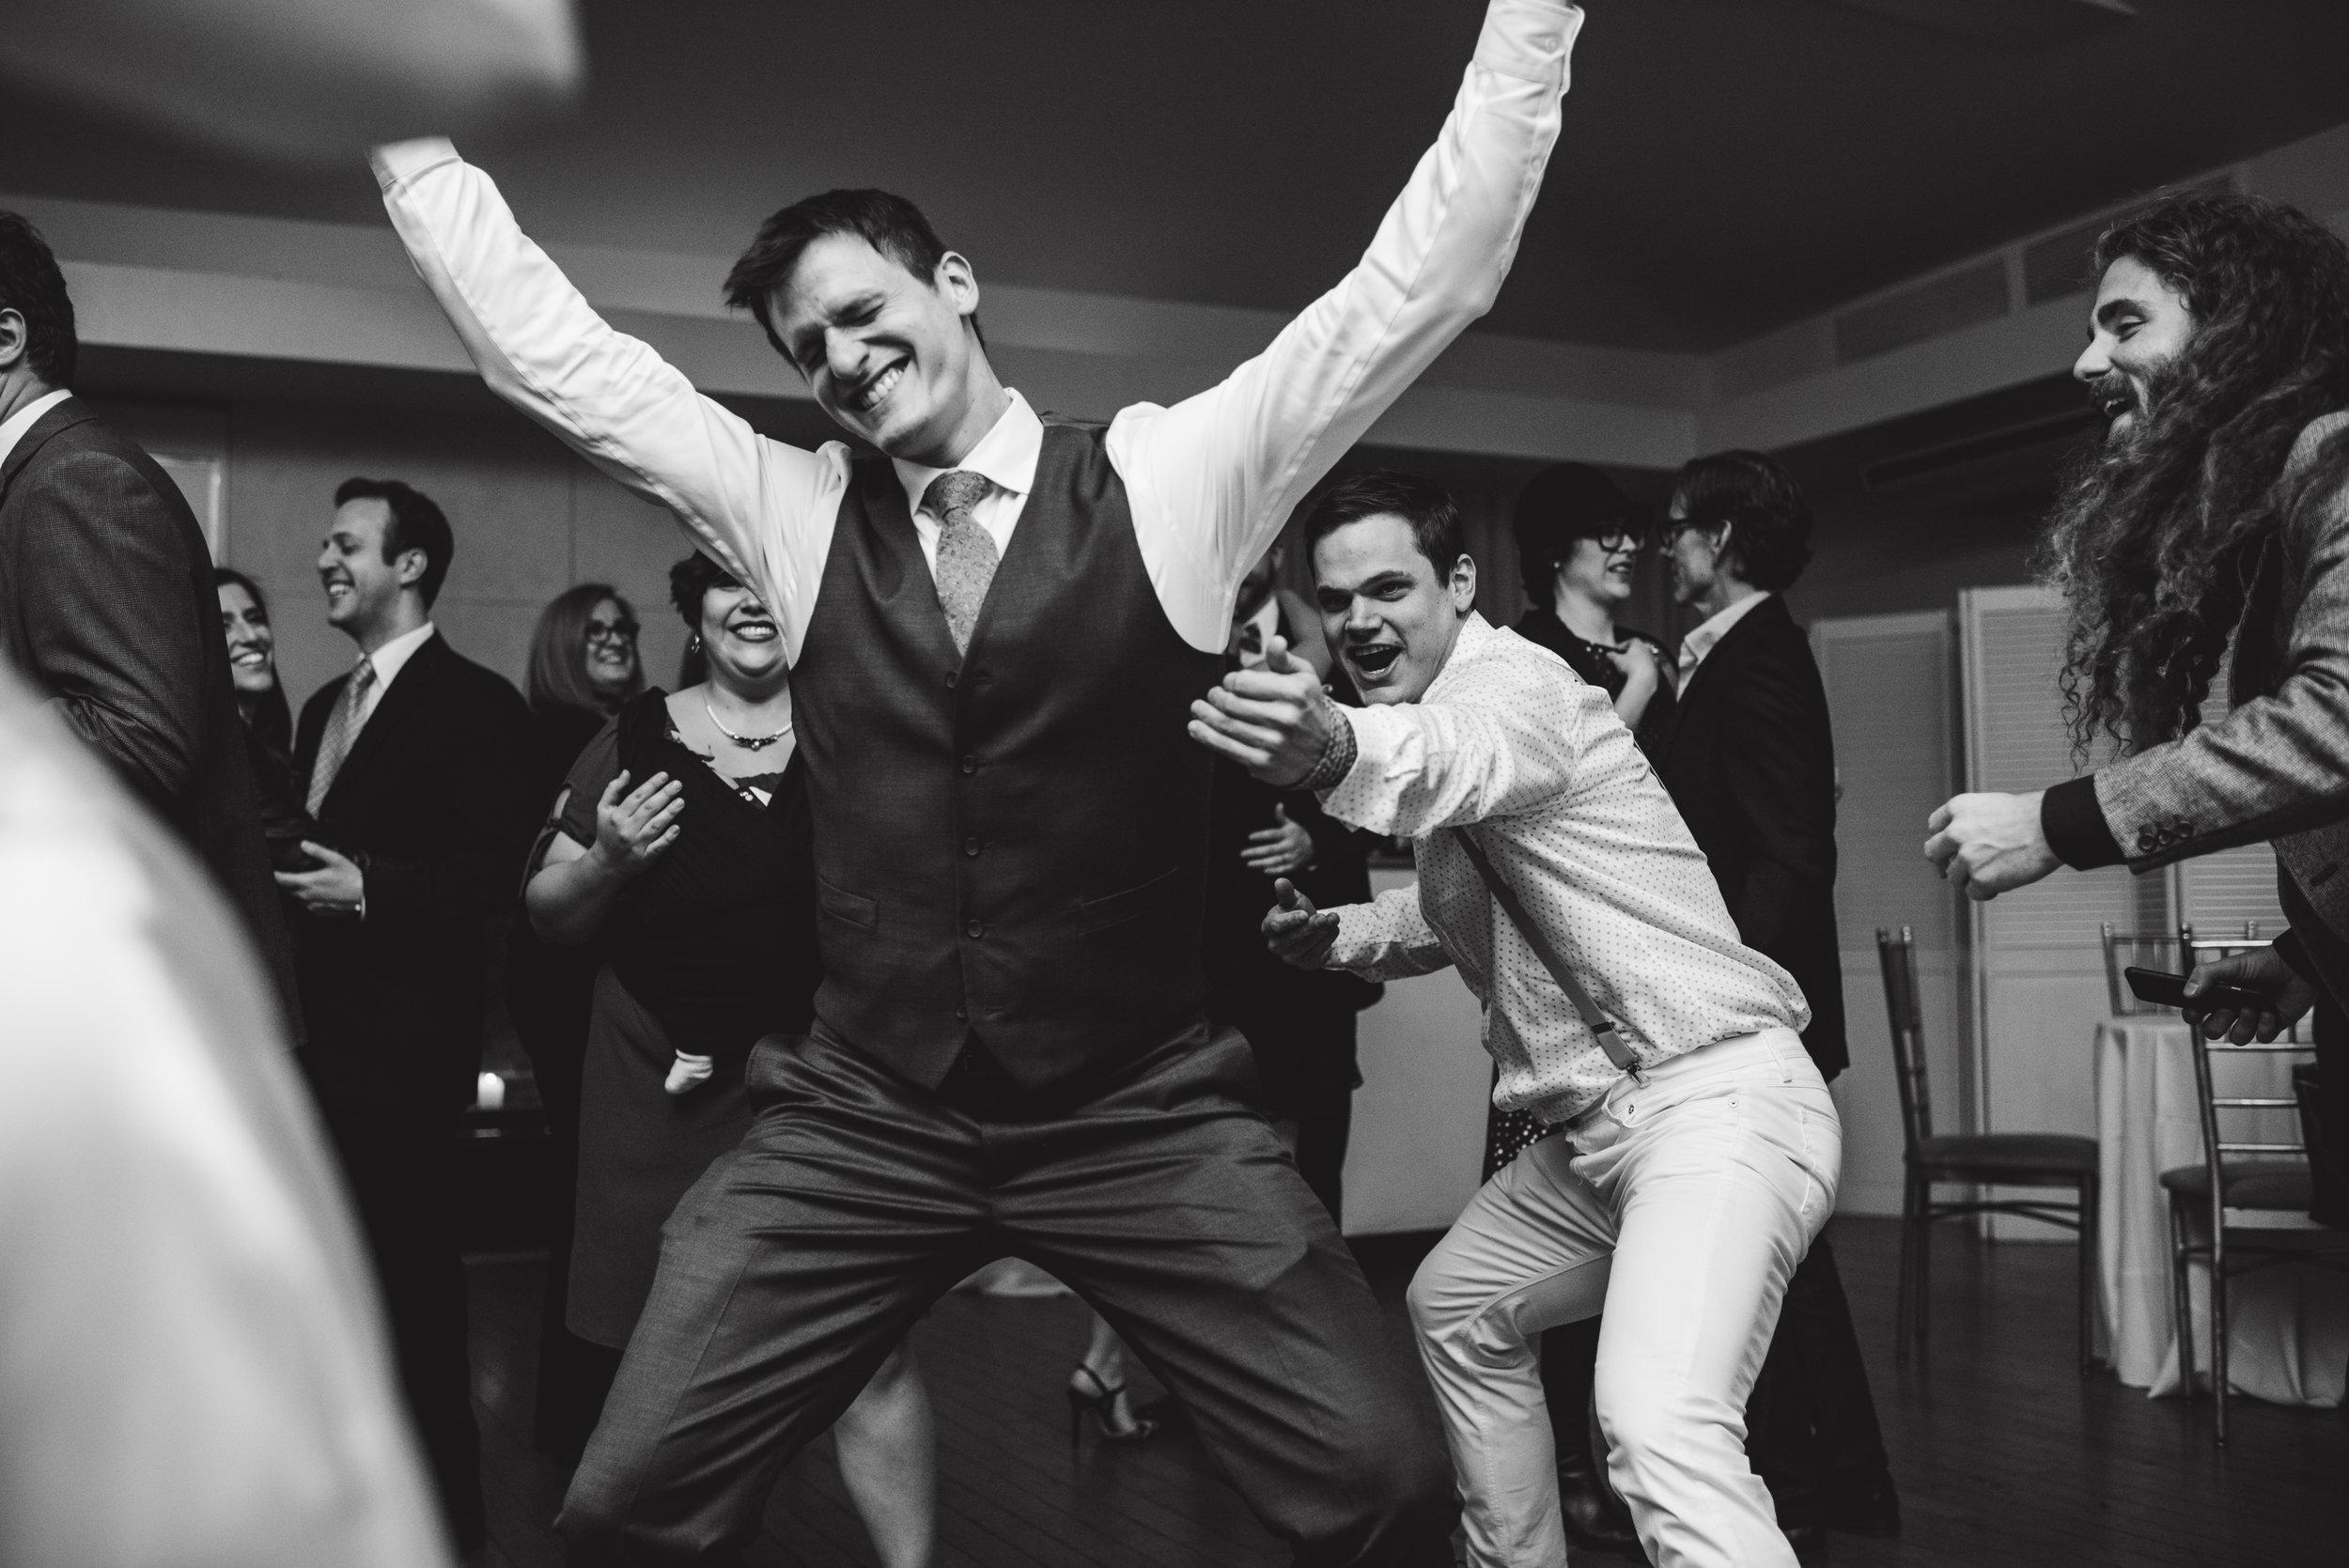 LIZA & JON - BATTERY PARK WEDDING - NYC INTIMATE WEDDING PHOTOGRAPHER - CHI-CHI AGBIM-689.jpg